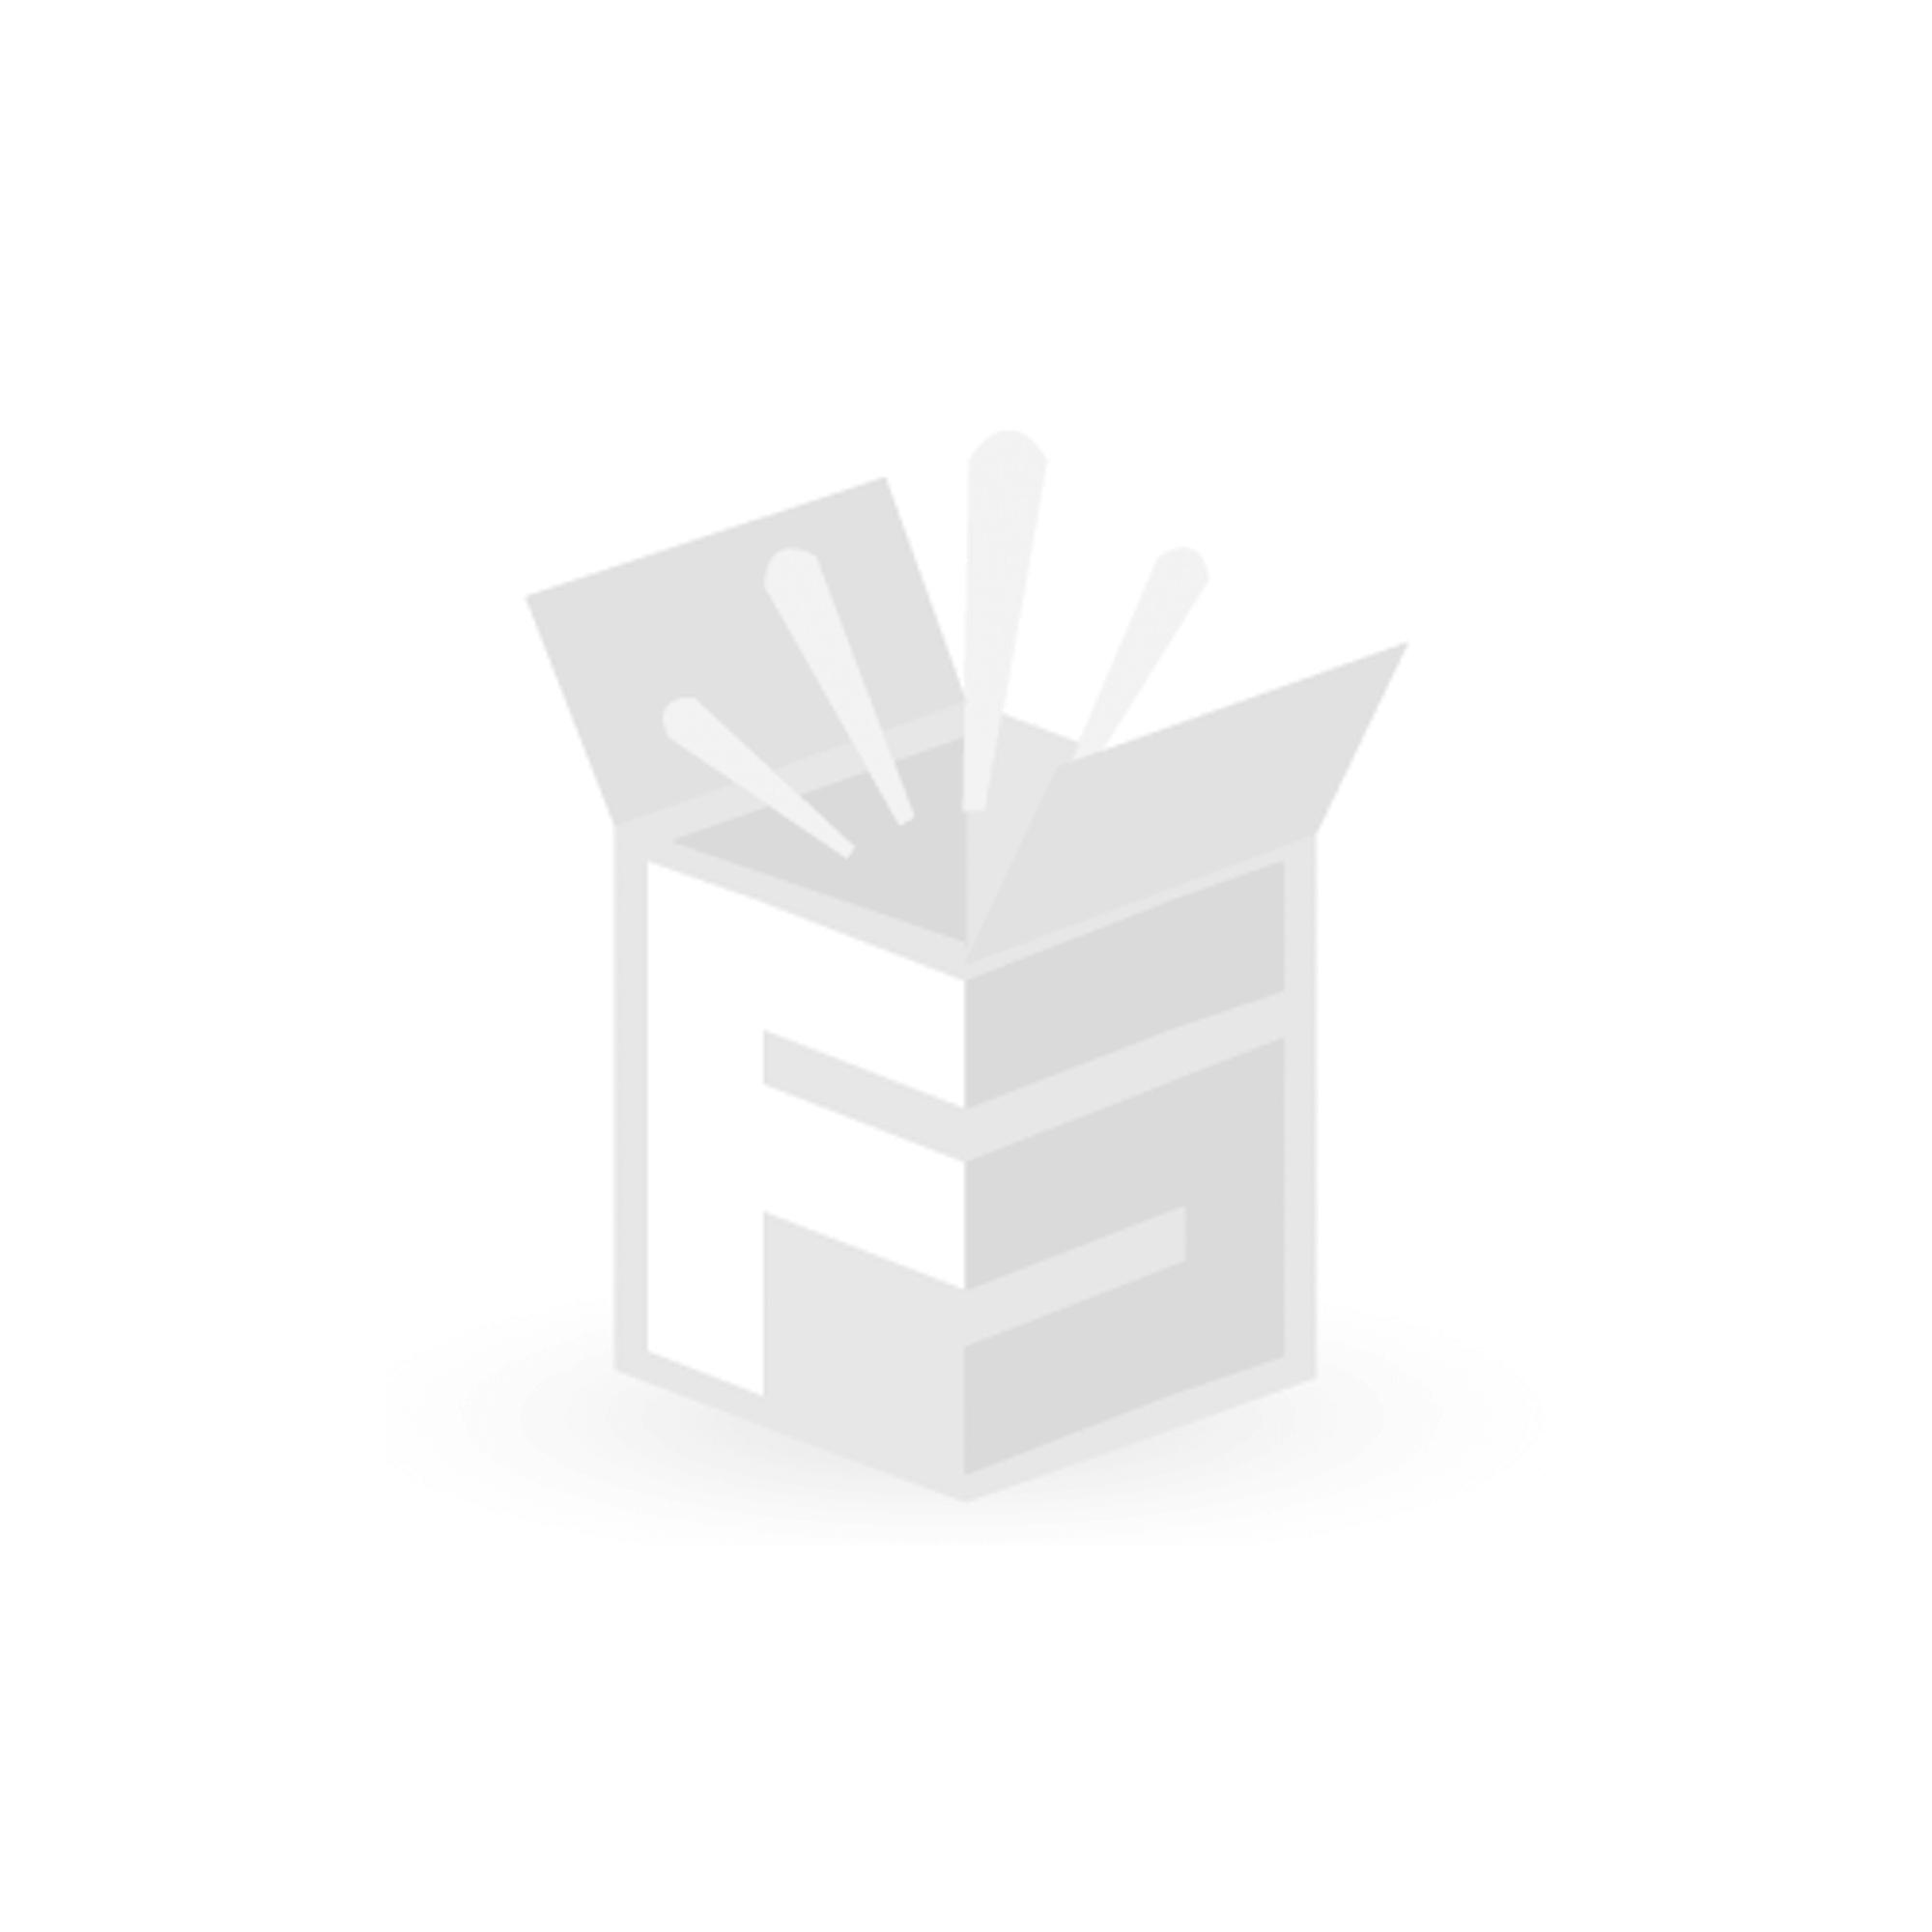 Bosch Mini-Ratschen-Set inkl. Handschraubendreher 27-teilig